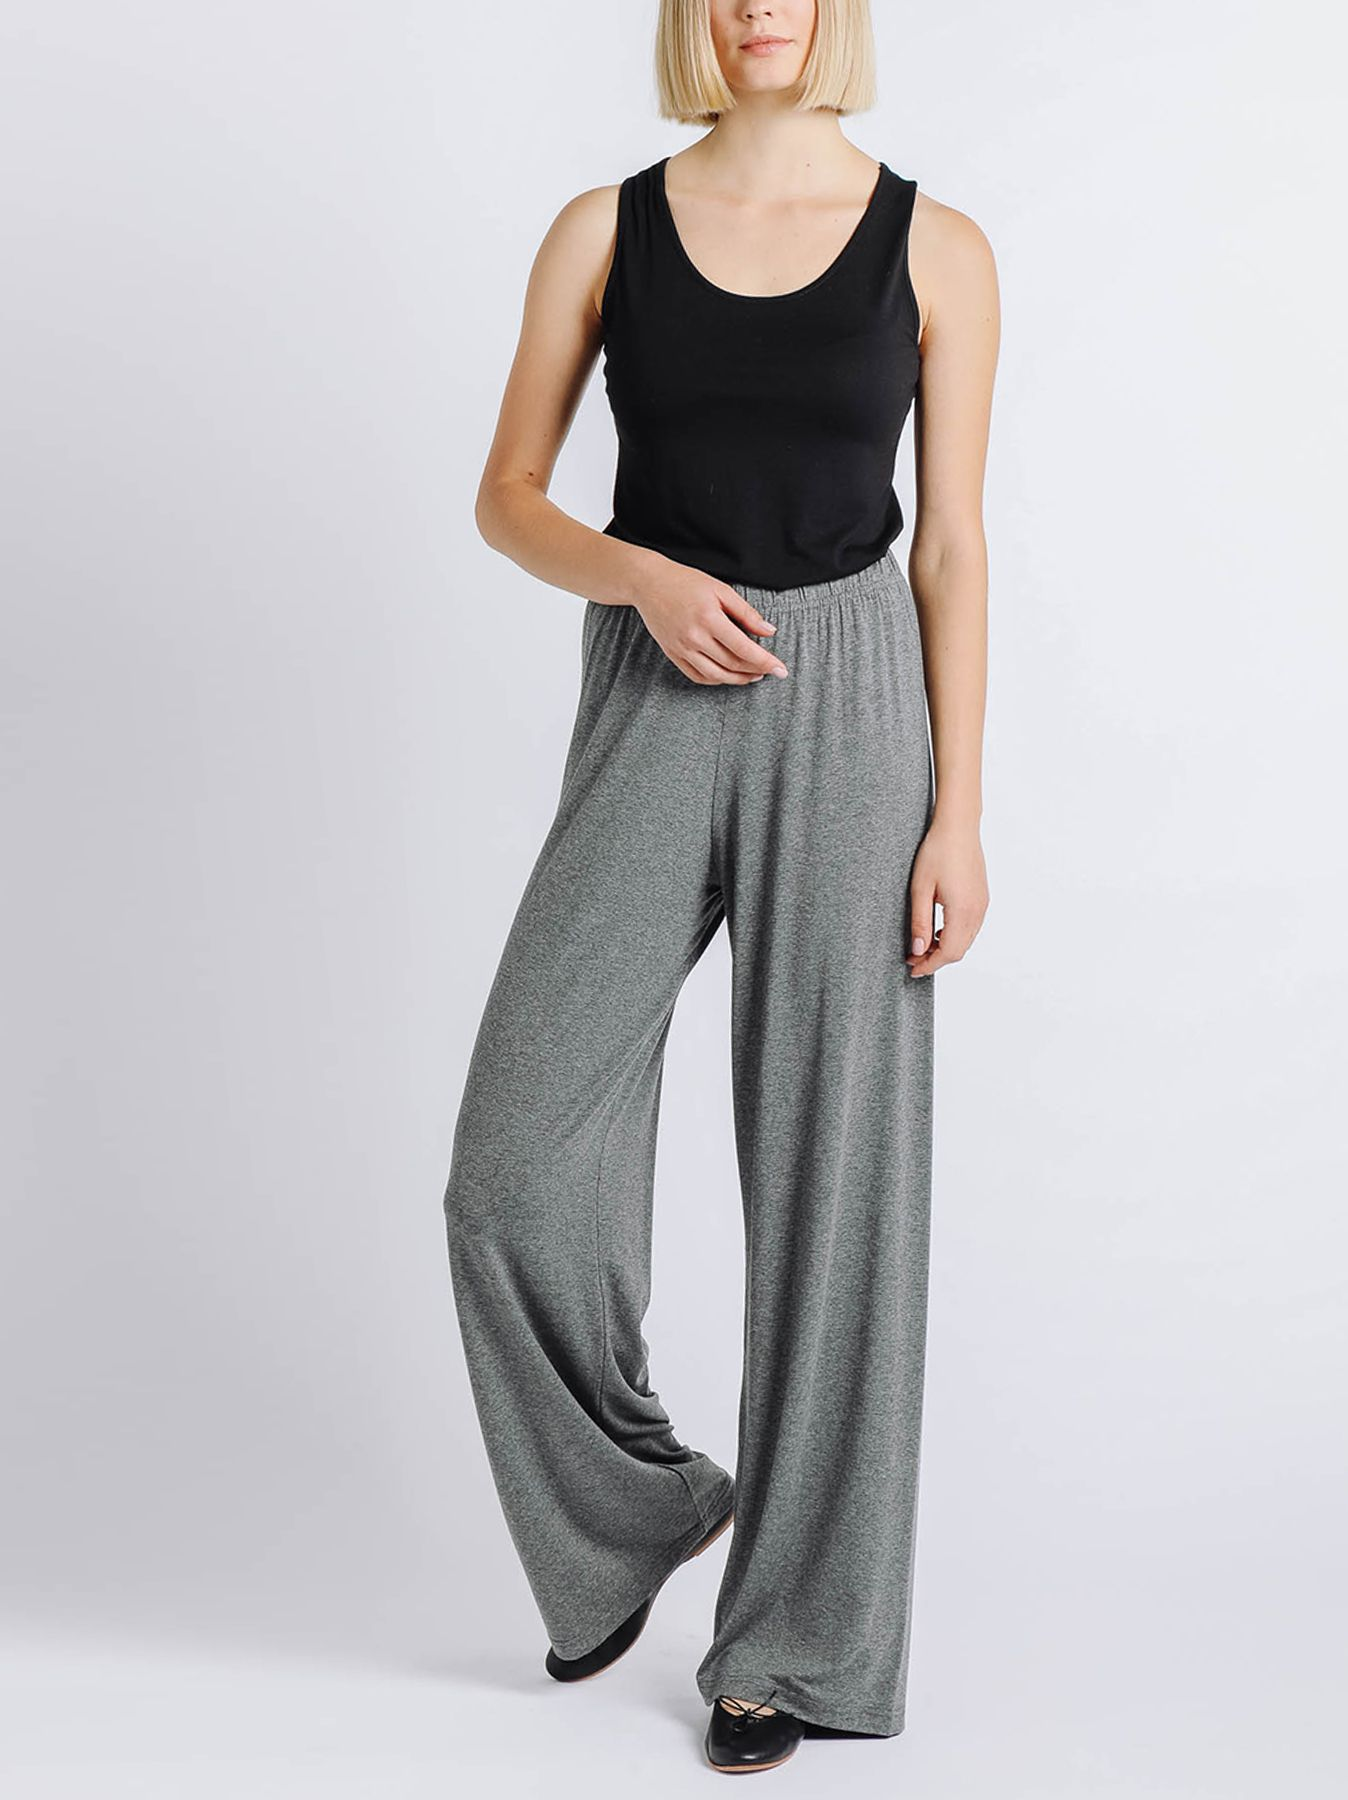 Pantalone elastico GRIGIO